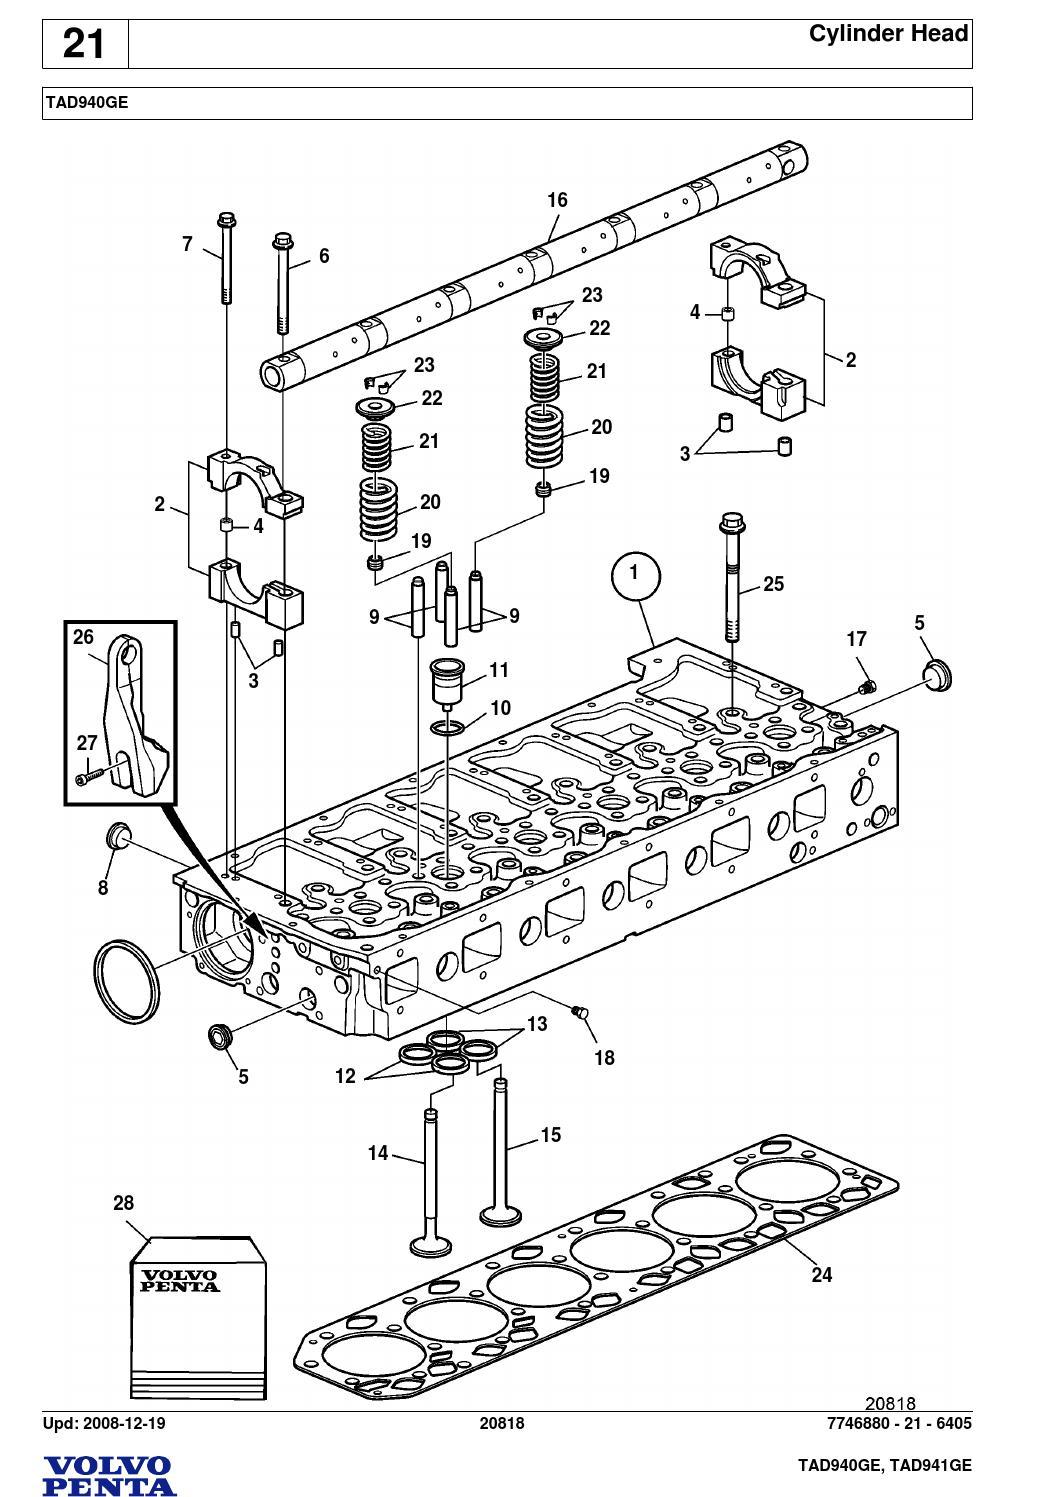 volvo penta tad940ge tad941ge by power generation issuu rh issuu com Parts List Parts Catalog